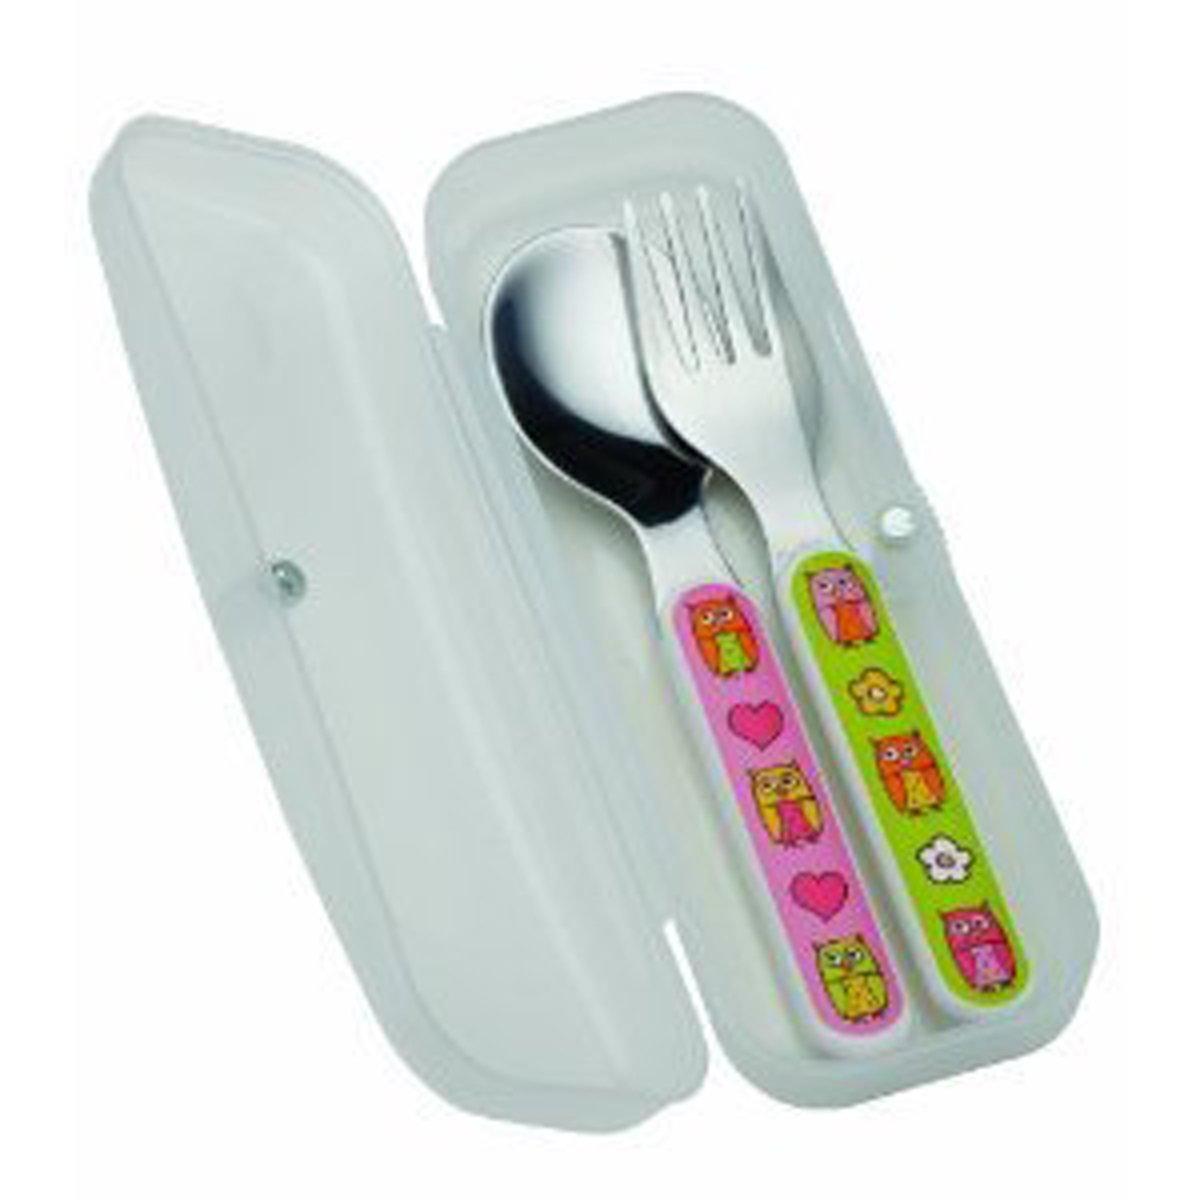 amazon com sugarbooger silverware set hoot baby spoons baby